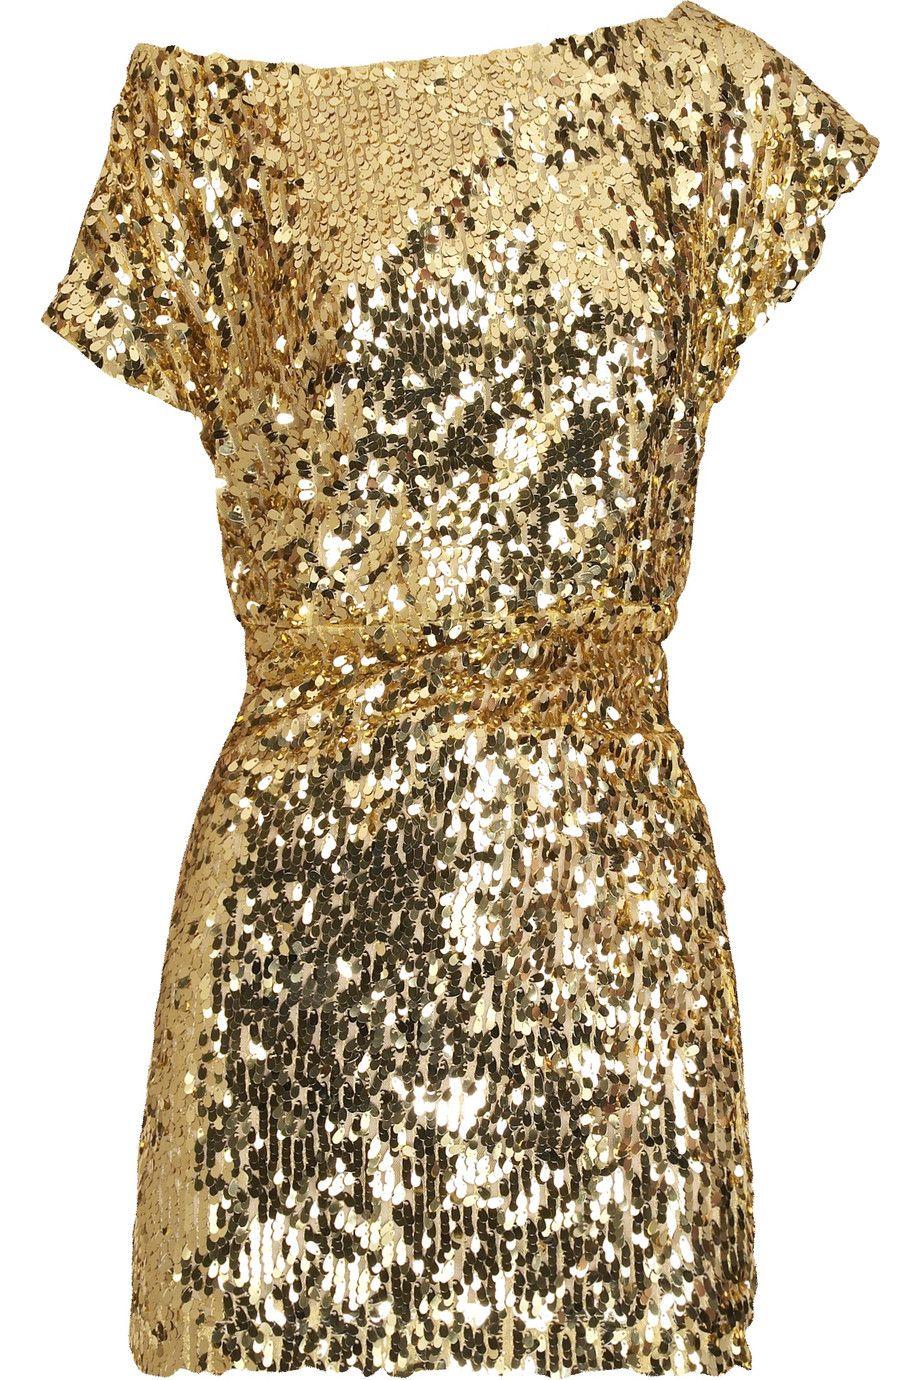 Gold Sparkle Dress